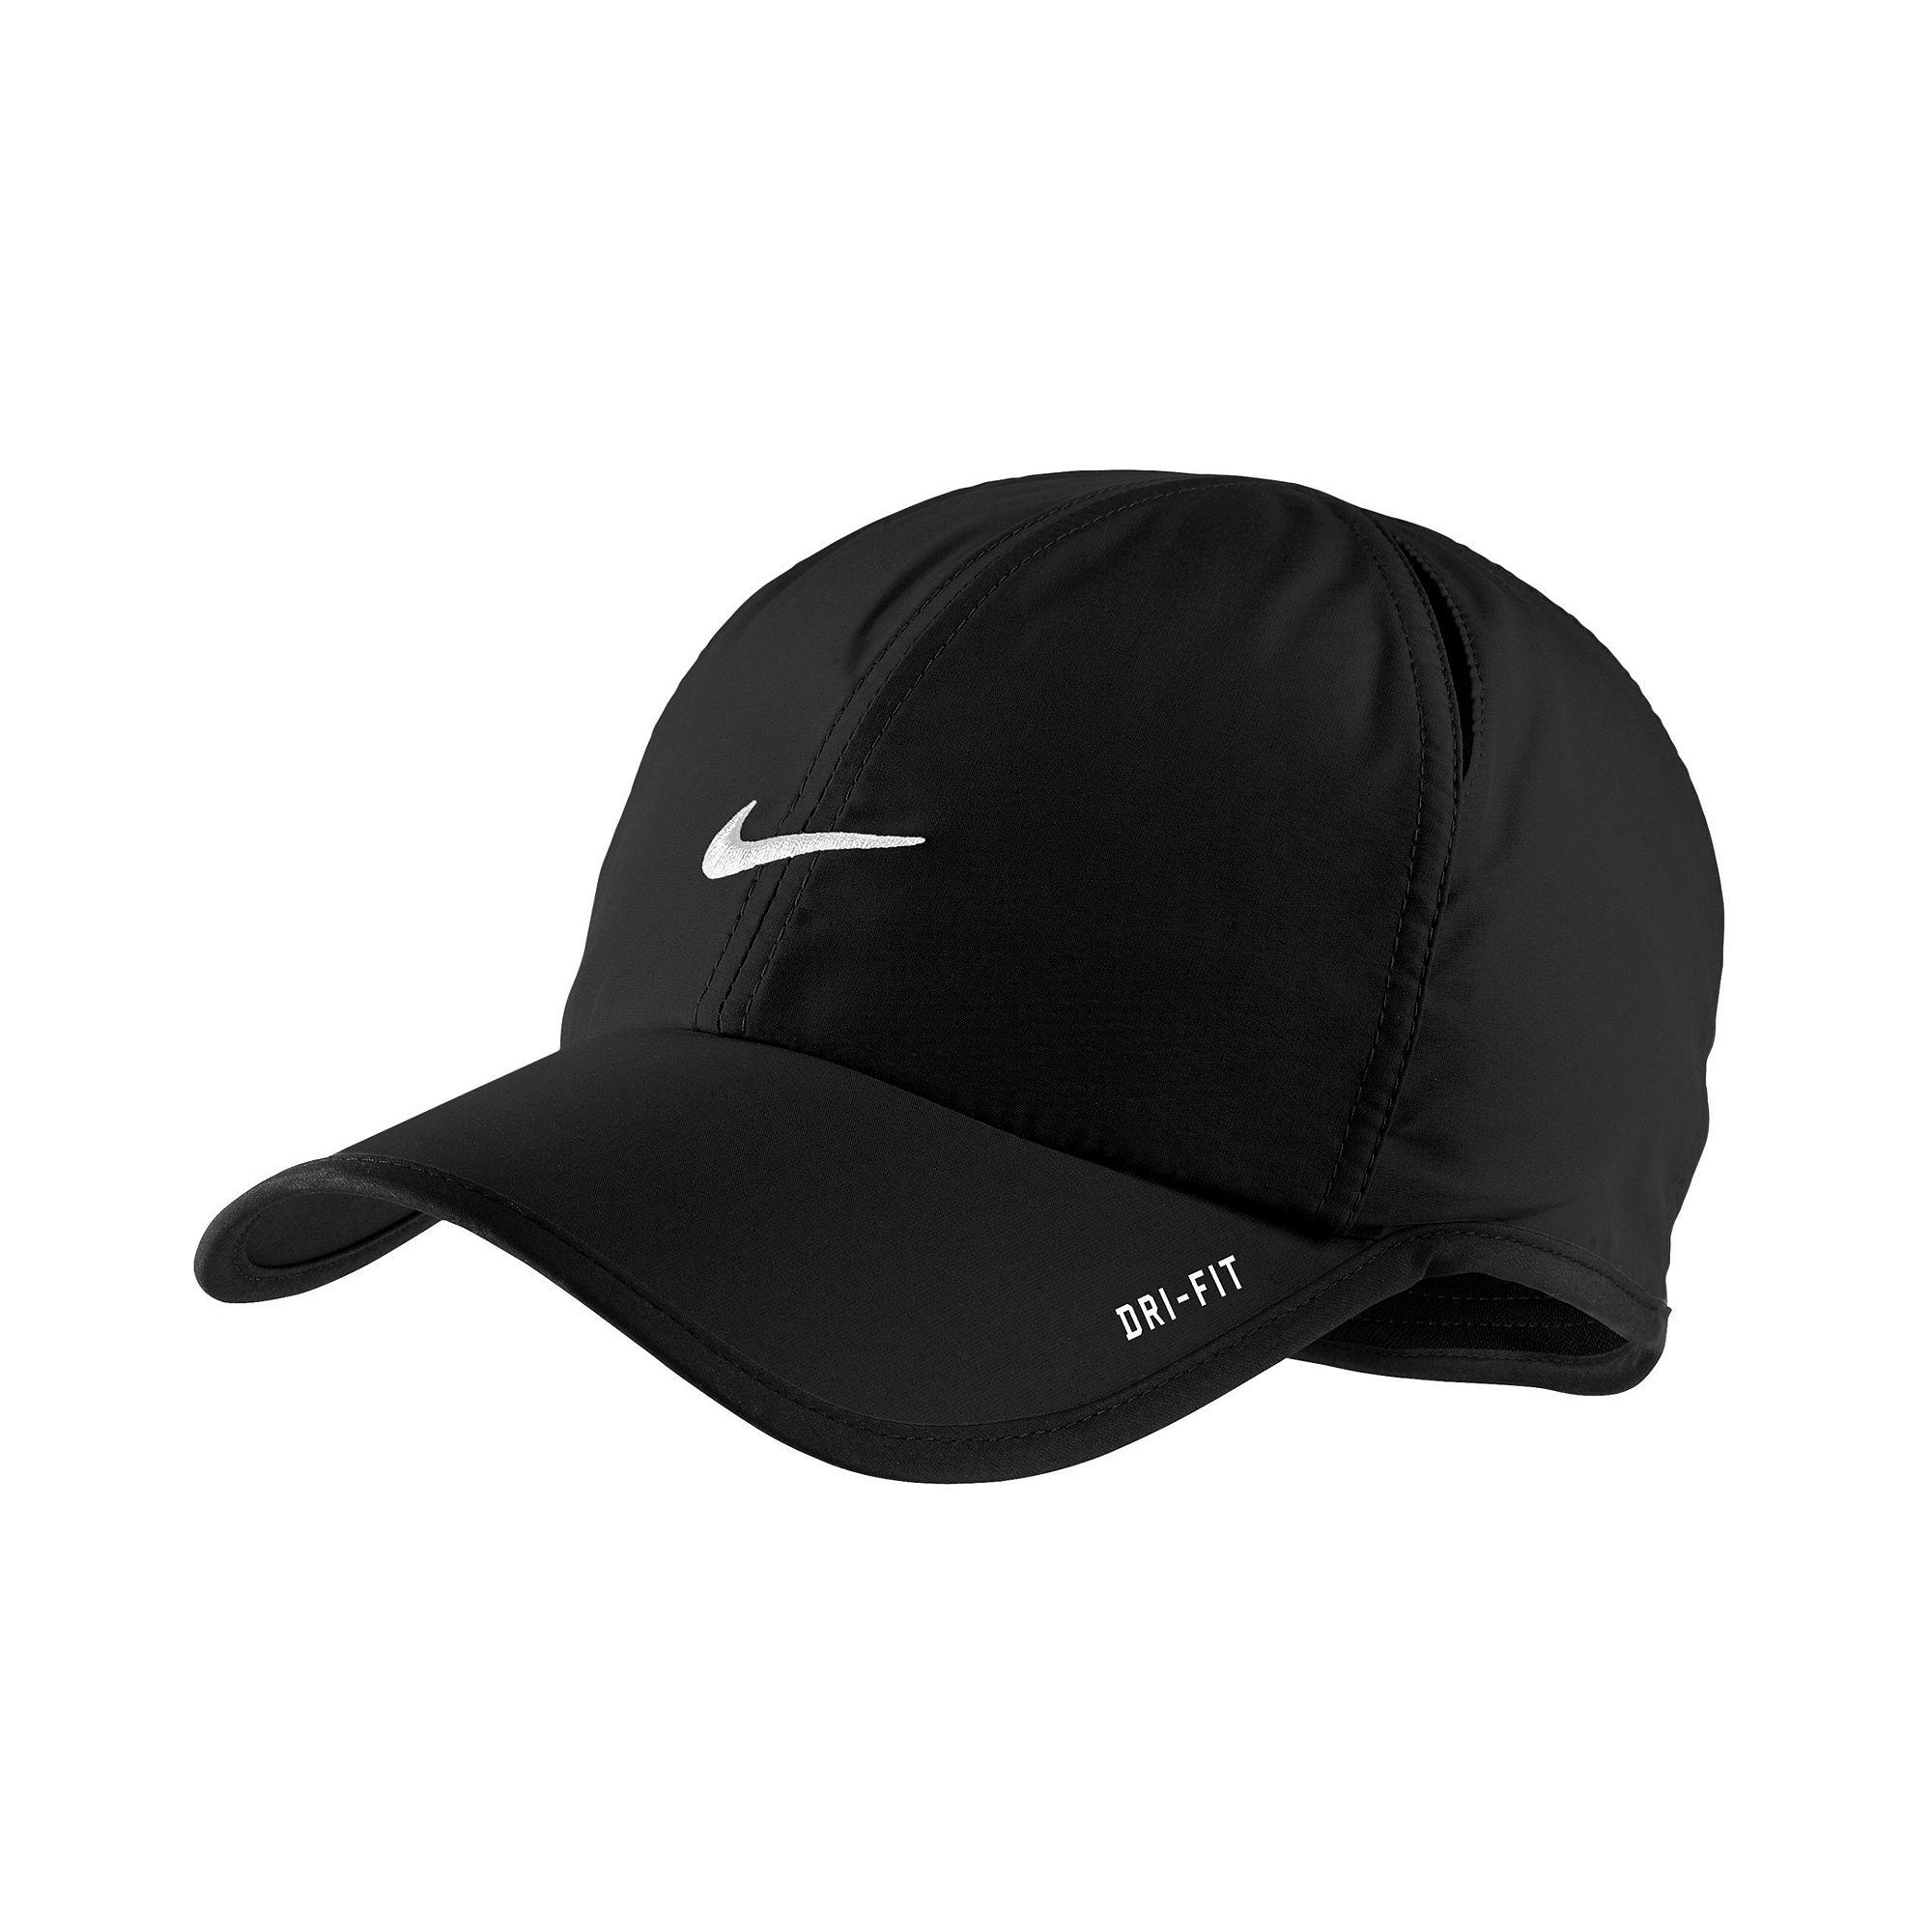 8cf7daab9fb Lyst - Nike Dri Fit Feather Light Cap in Black for Men